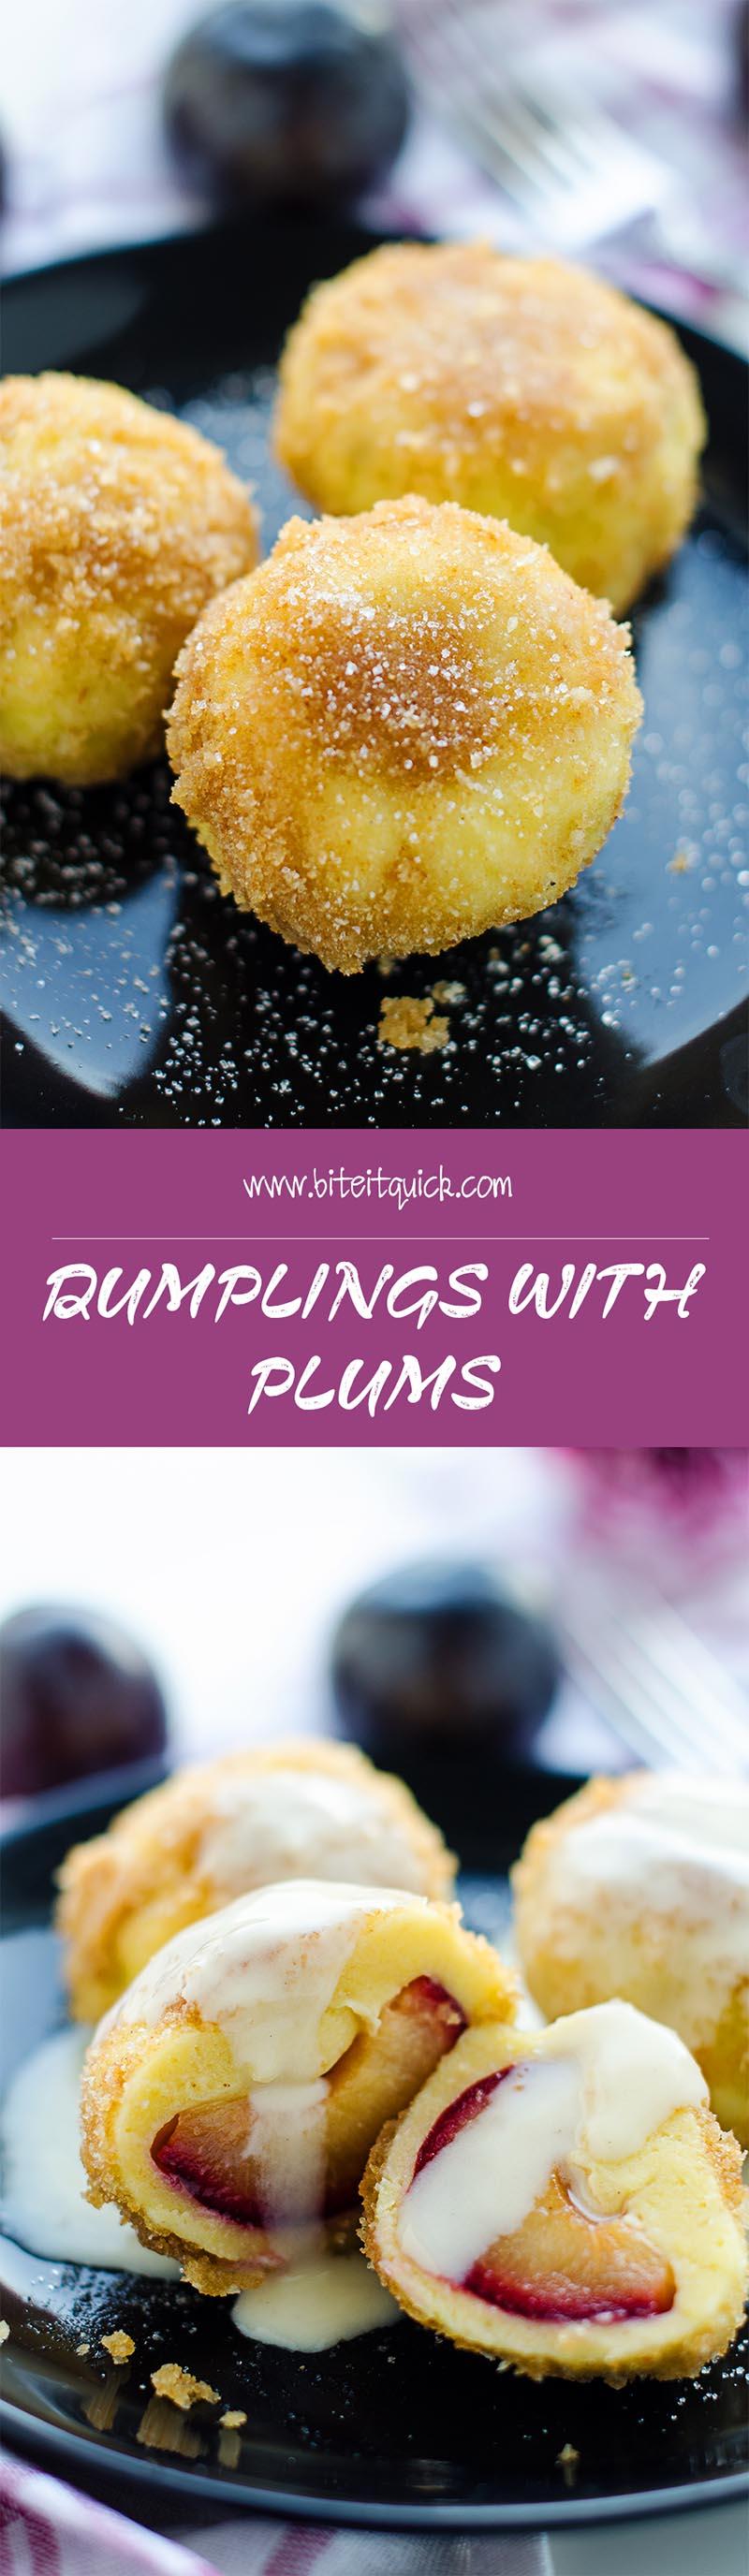 dumplings pinterest